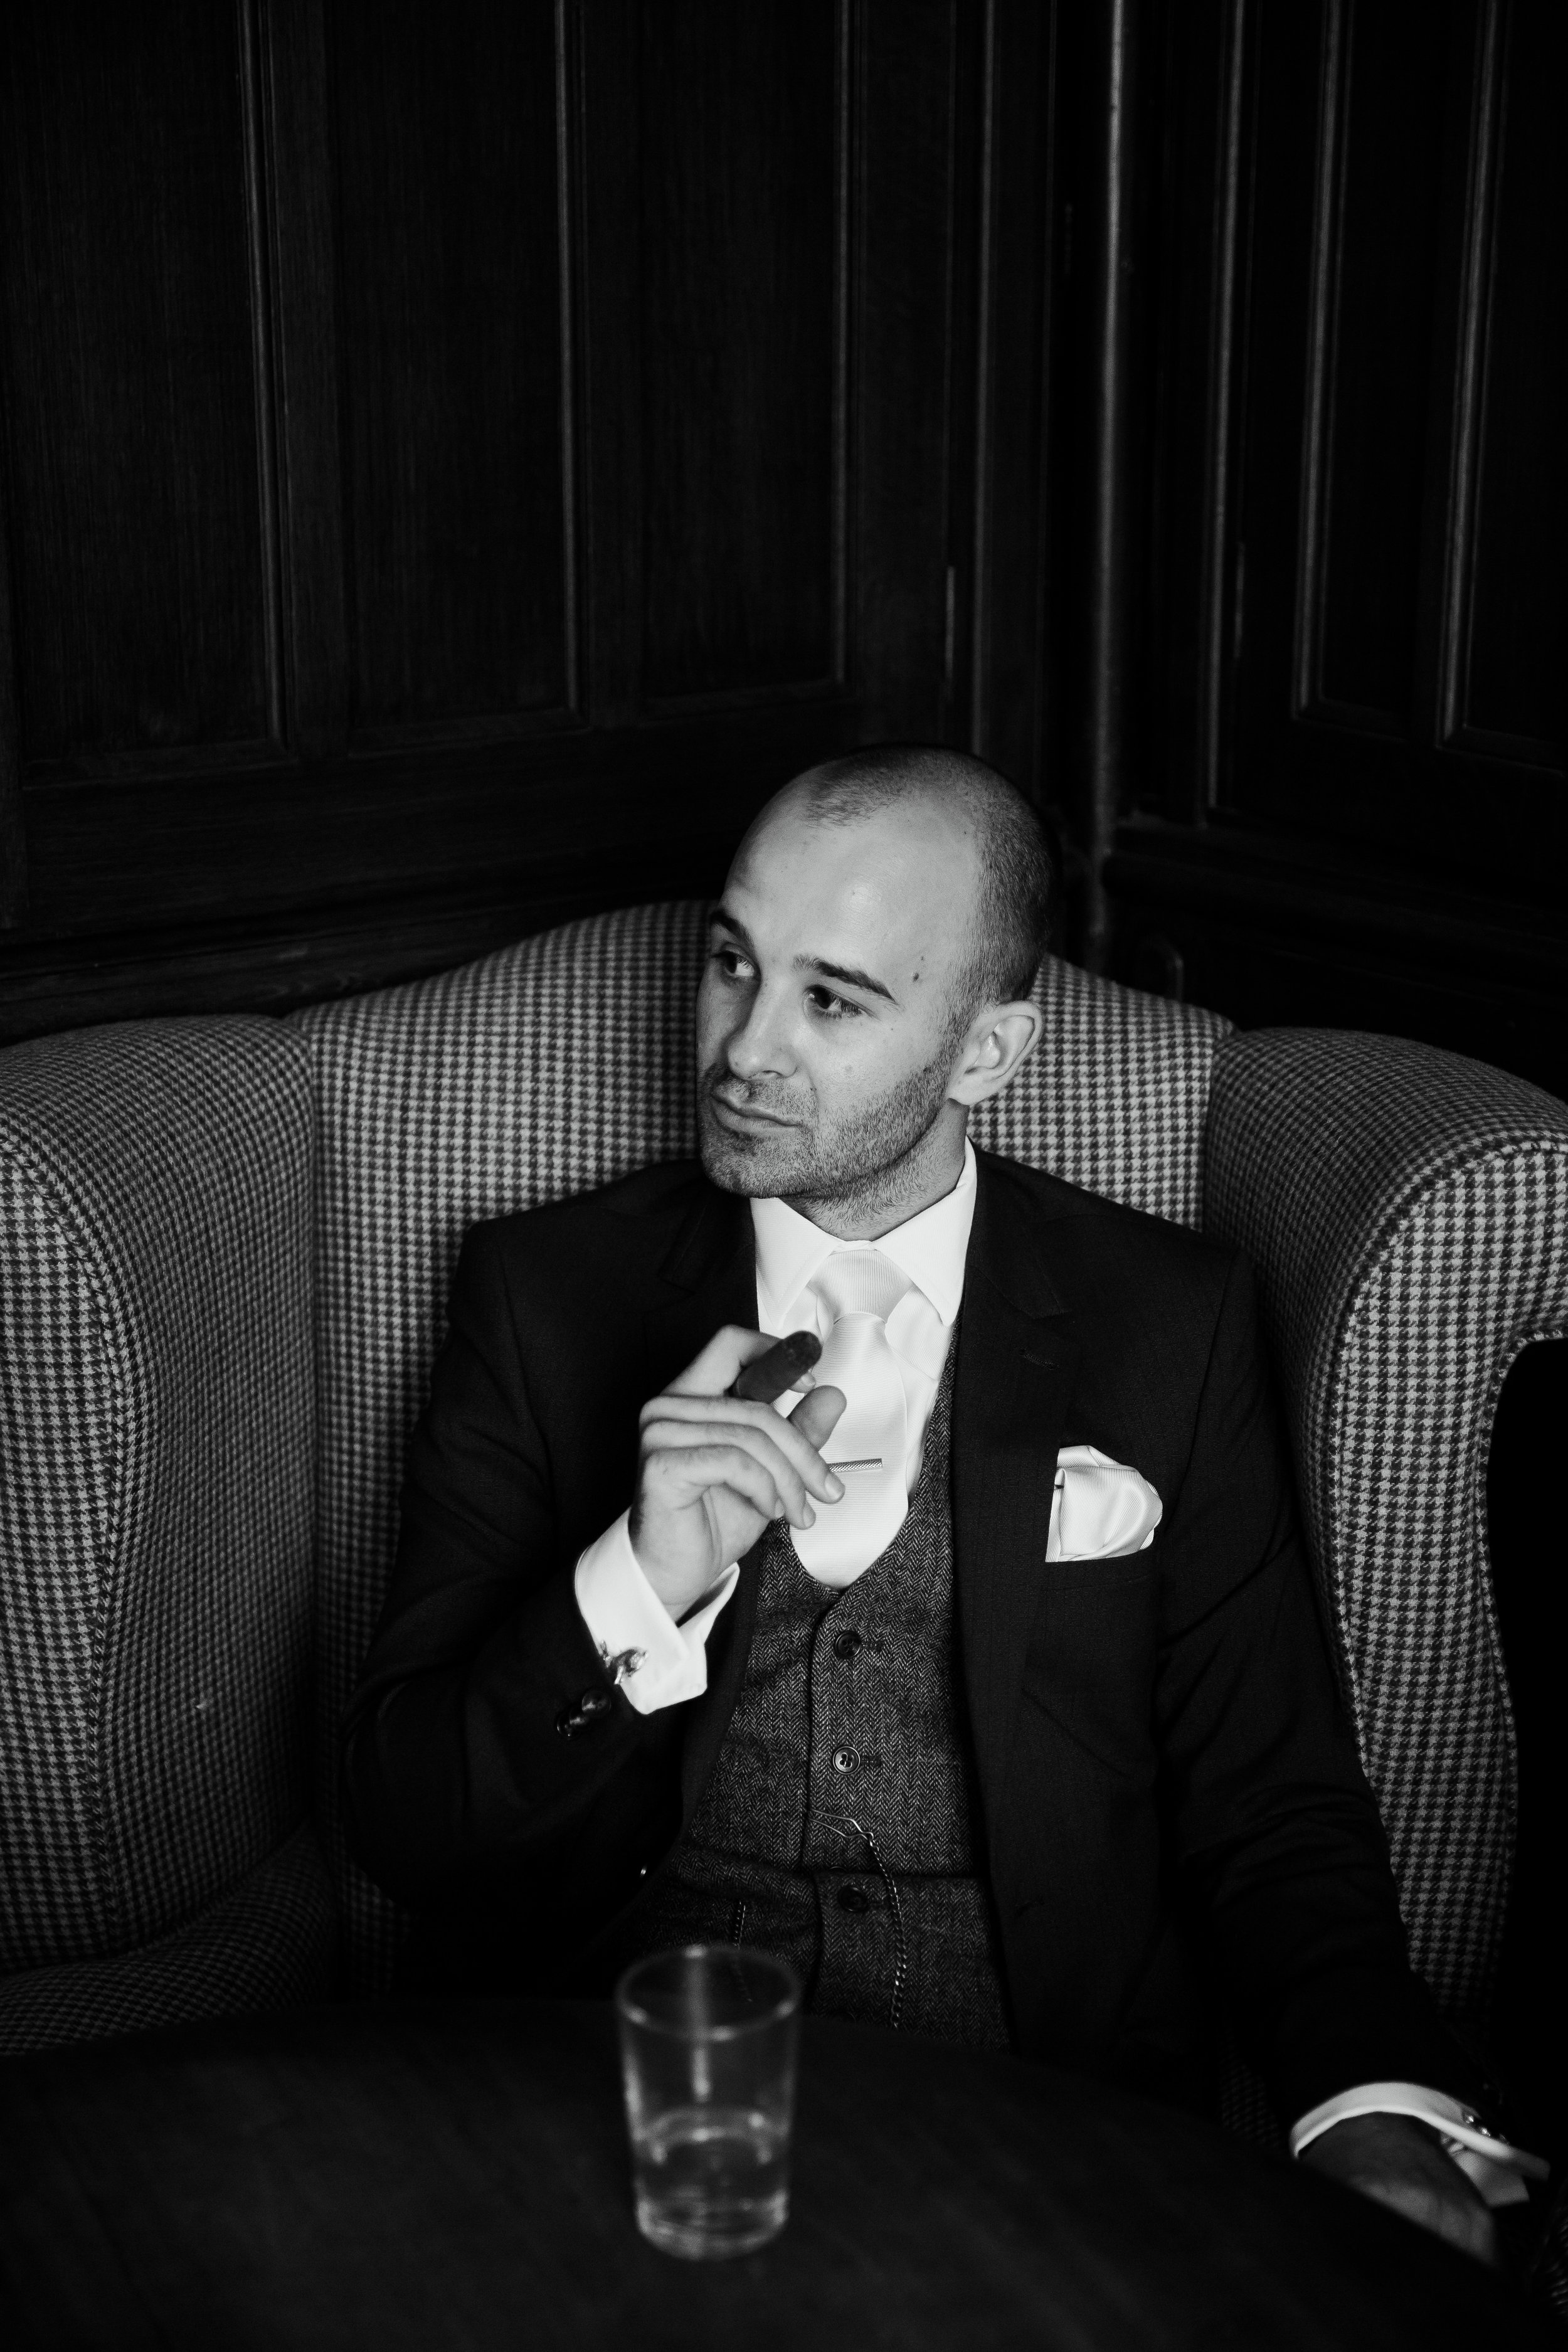 Nervous Groom before wedding Wedding Photographer Yorkshire